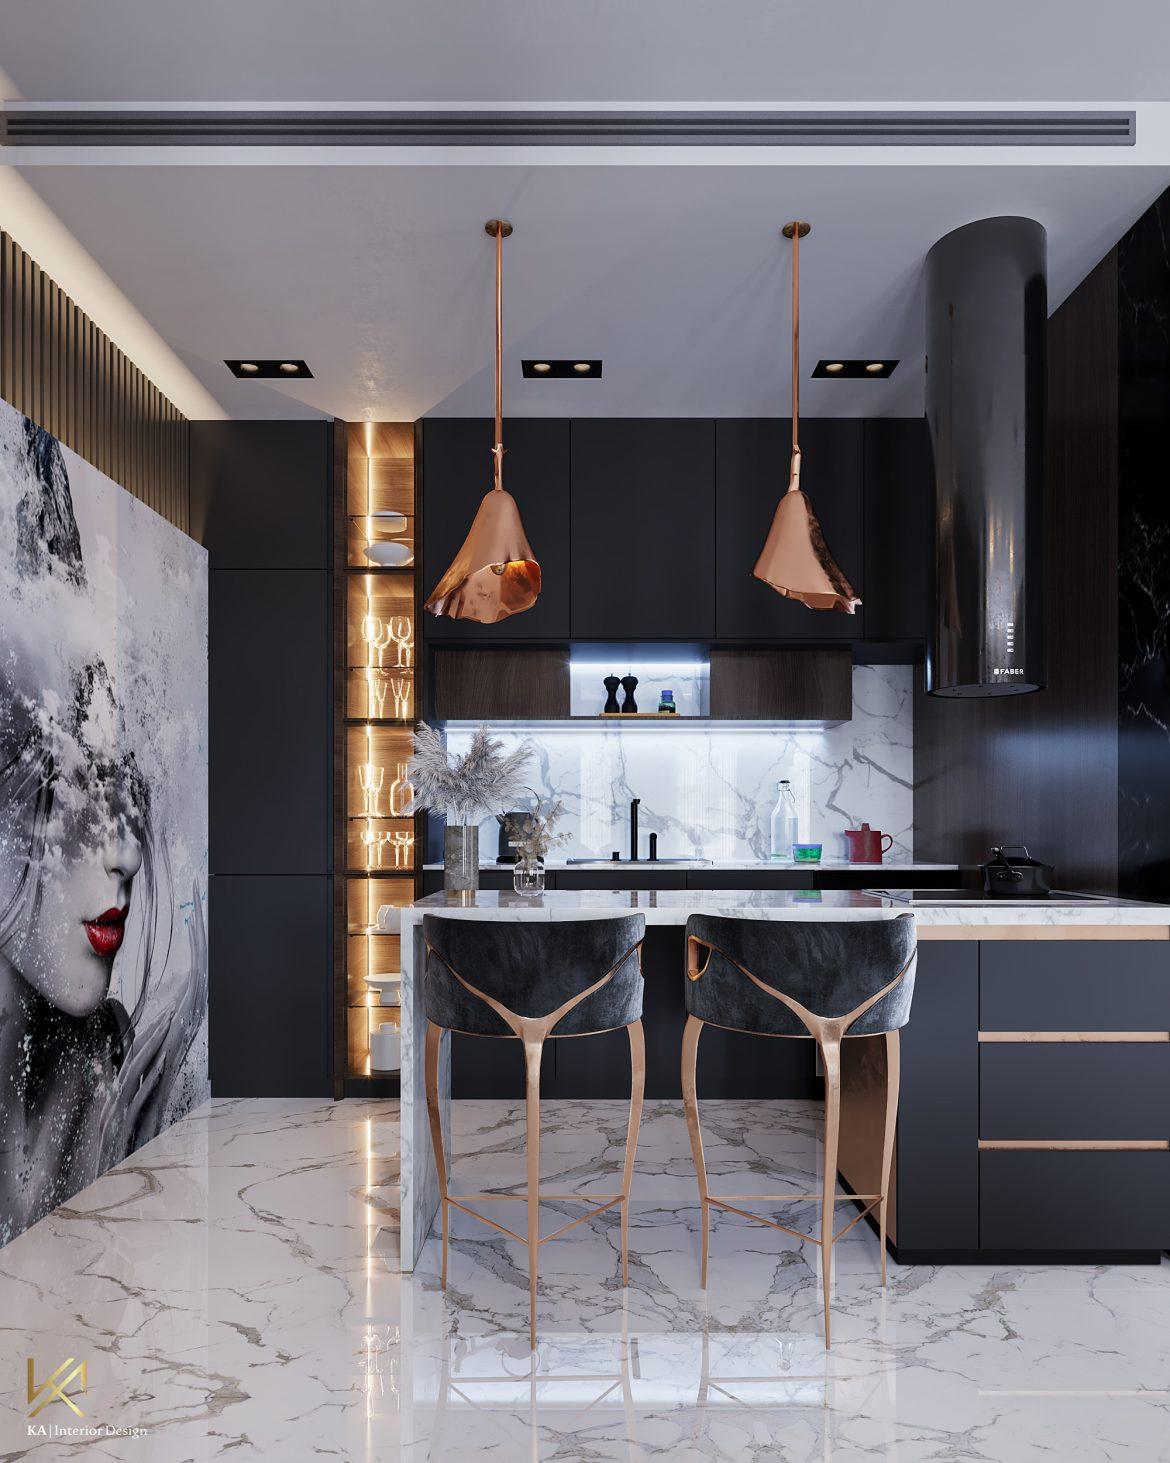 Covet House x K.A Interior Design: A Opulent Modern Classic Villa in Riyadh  Covet House x K.A Interior Design:  A Opulent Modern Classic Villa In Riyadh covet house k a interior design lavish modern classic villa riyadh 7